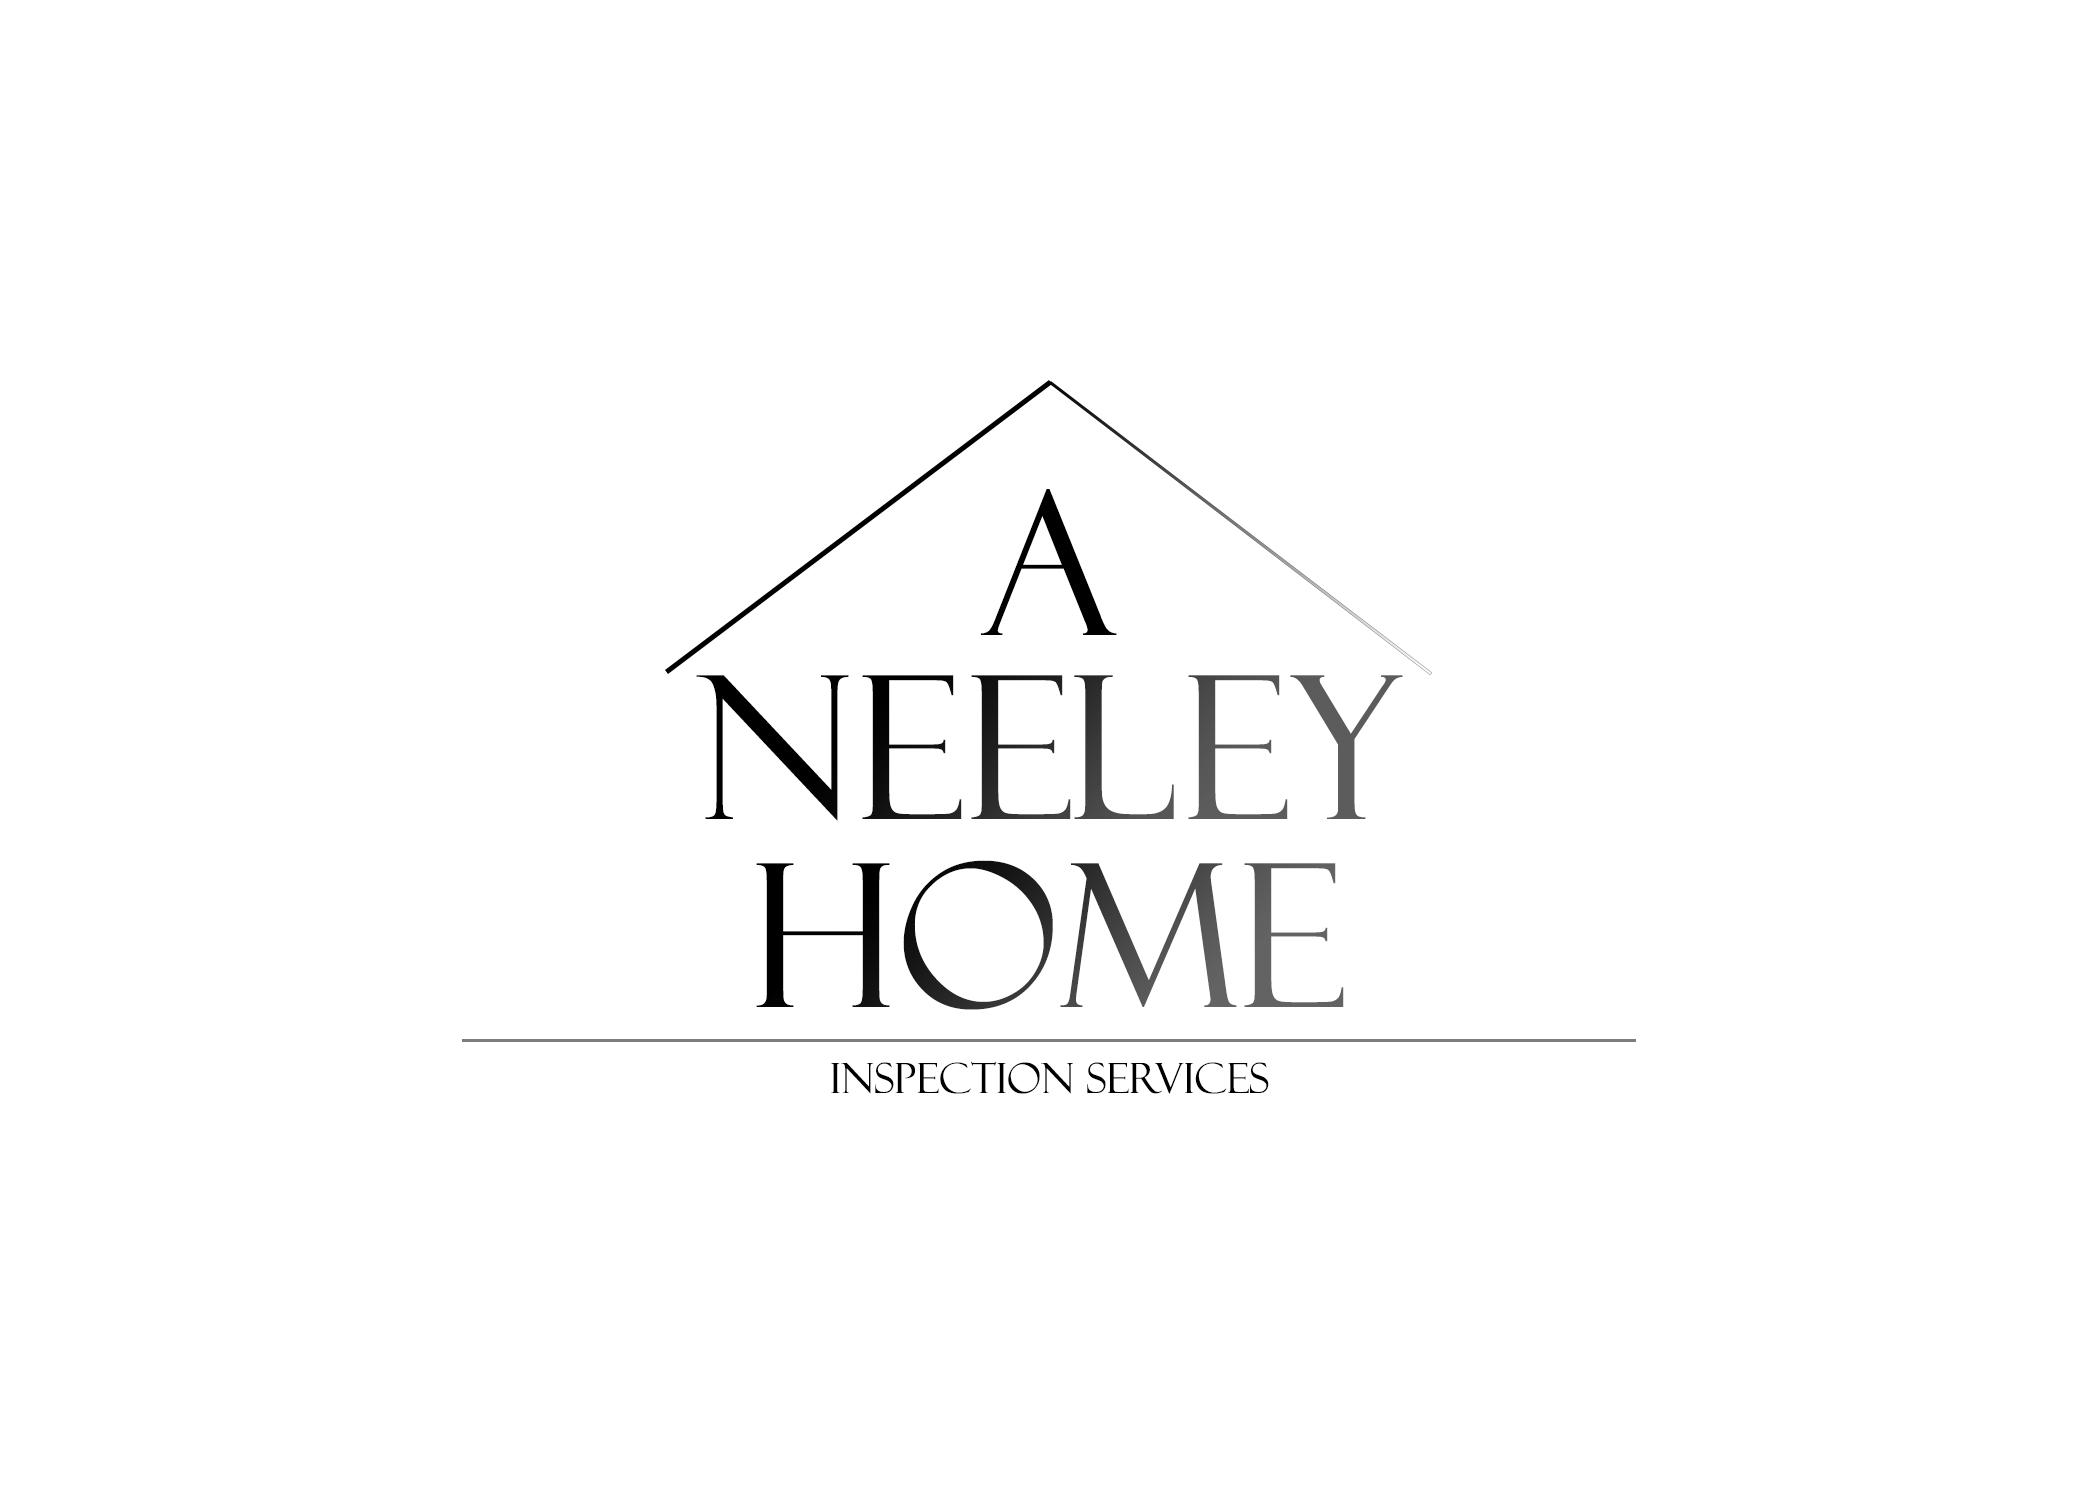 A Neeley Home Inspection Services logo